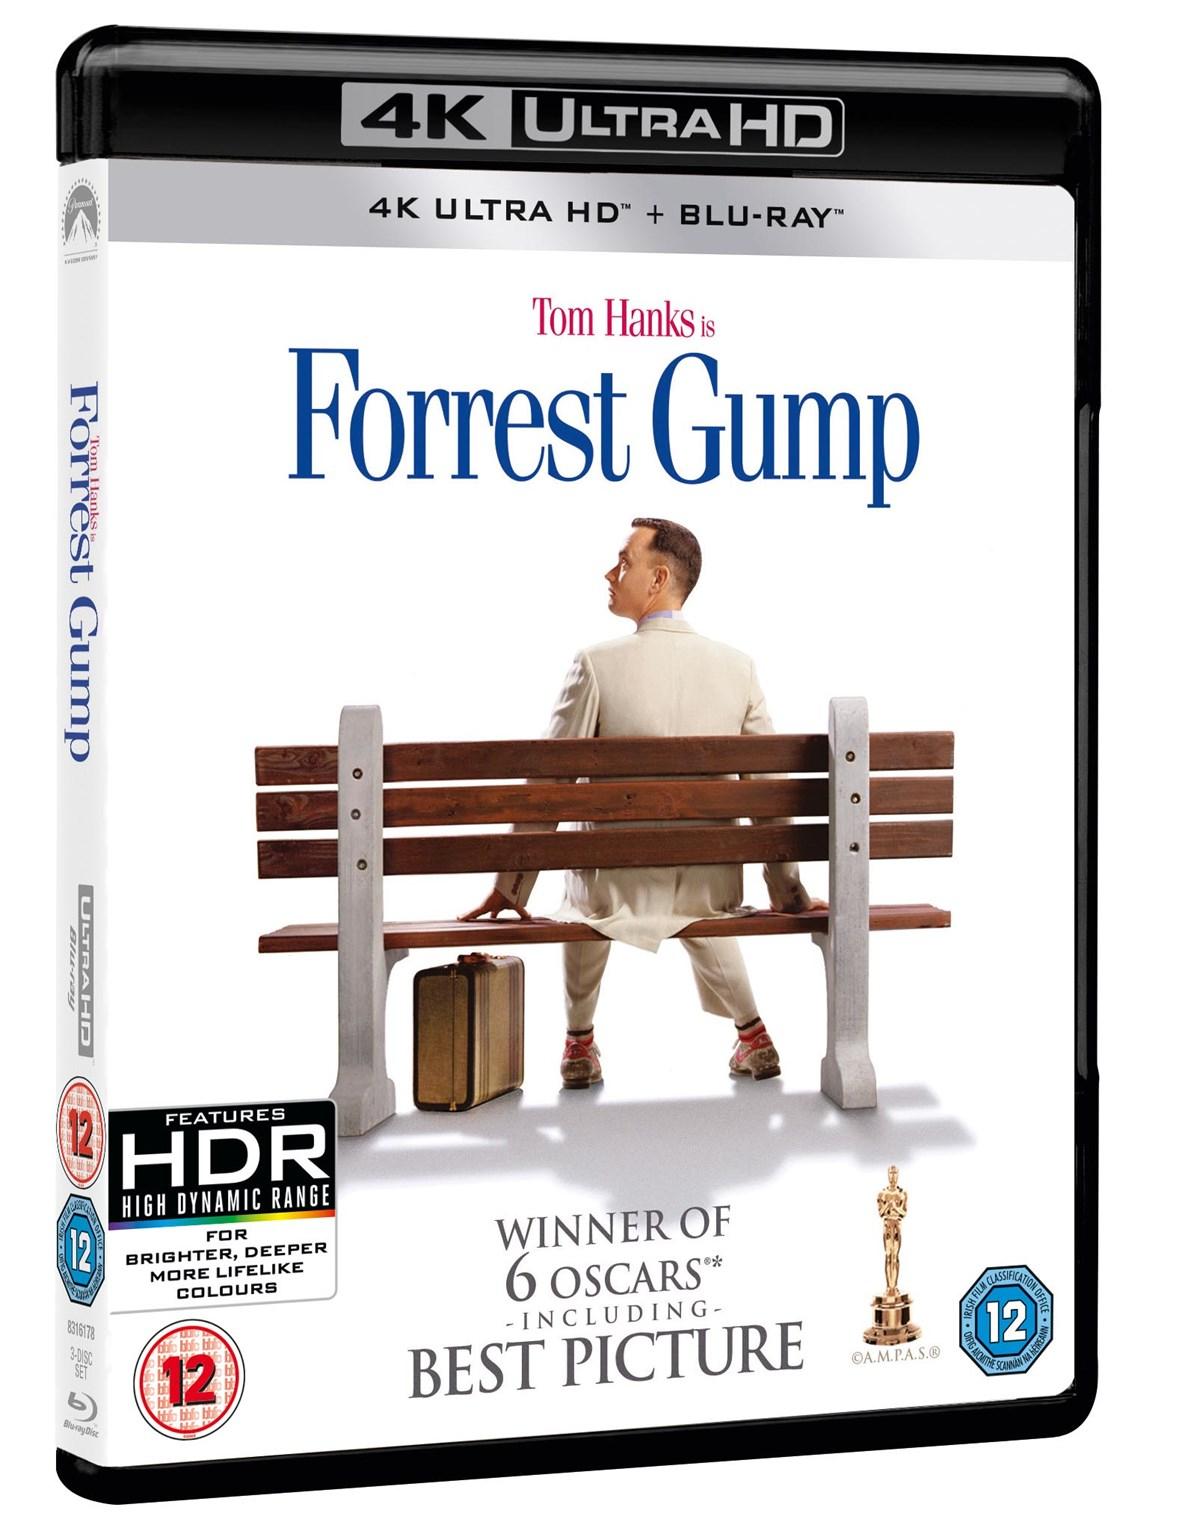 Forrest Gump (4K Blu-ray + Blu-ray) und weitere 4K Tom Hanks Filme für je 12,22€ inkl. Versand (Zoom UK)